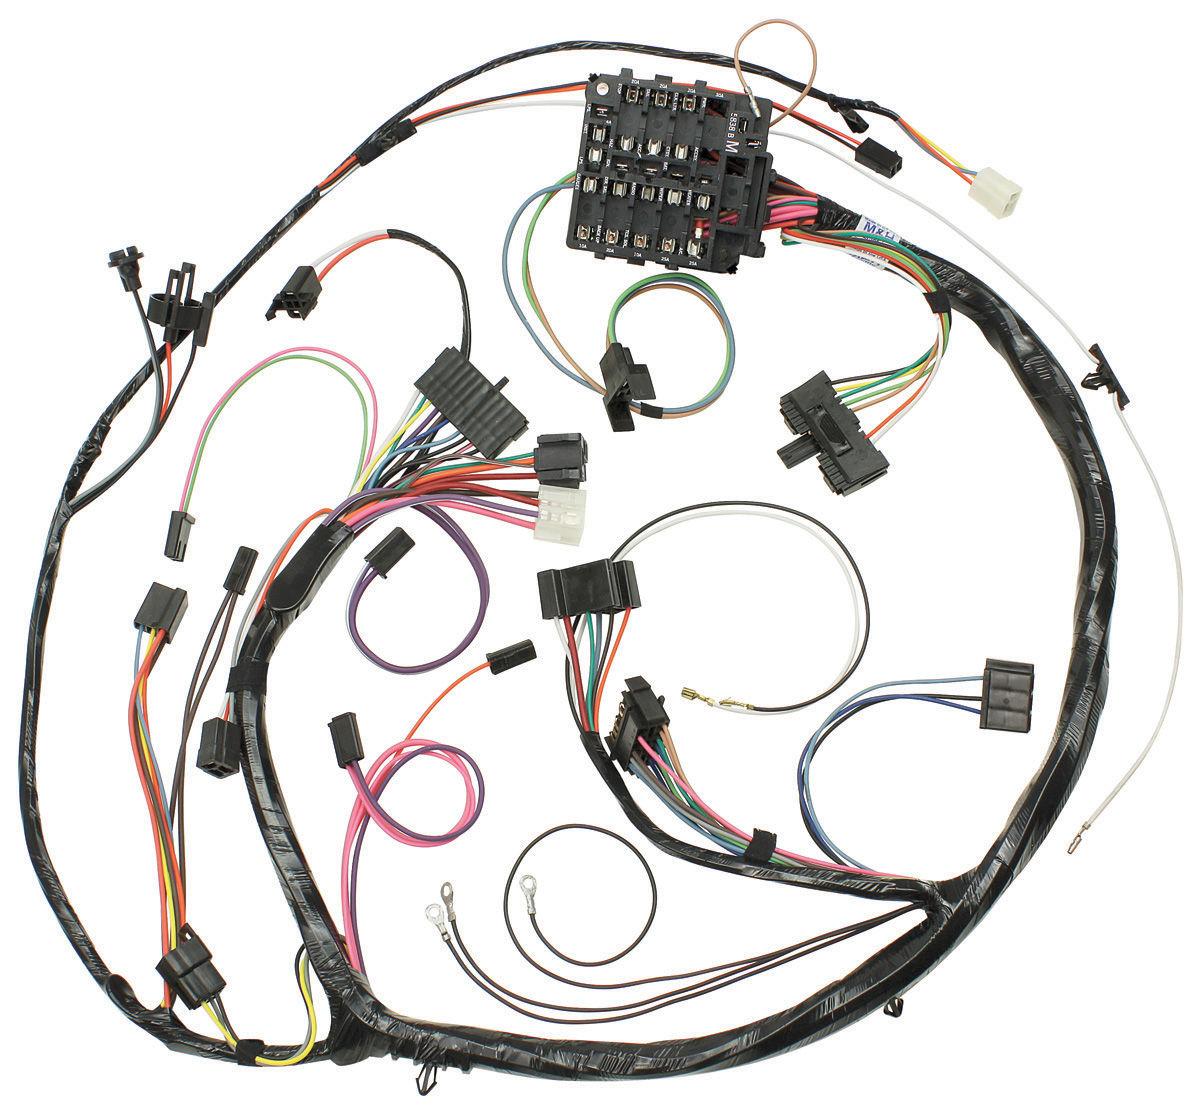 1971 Chevelle Dash/Instrument Panel Harness All, Round ...